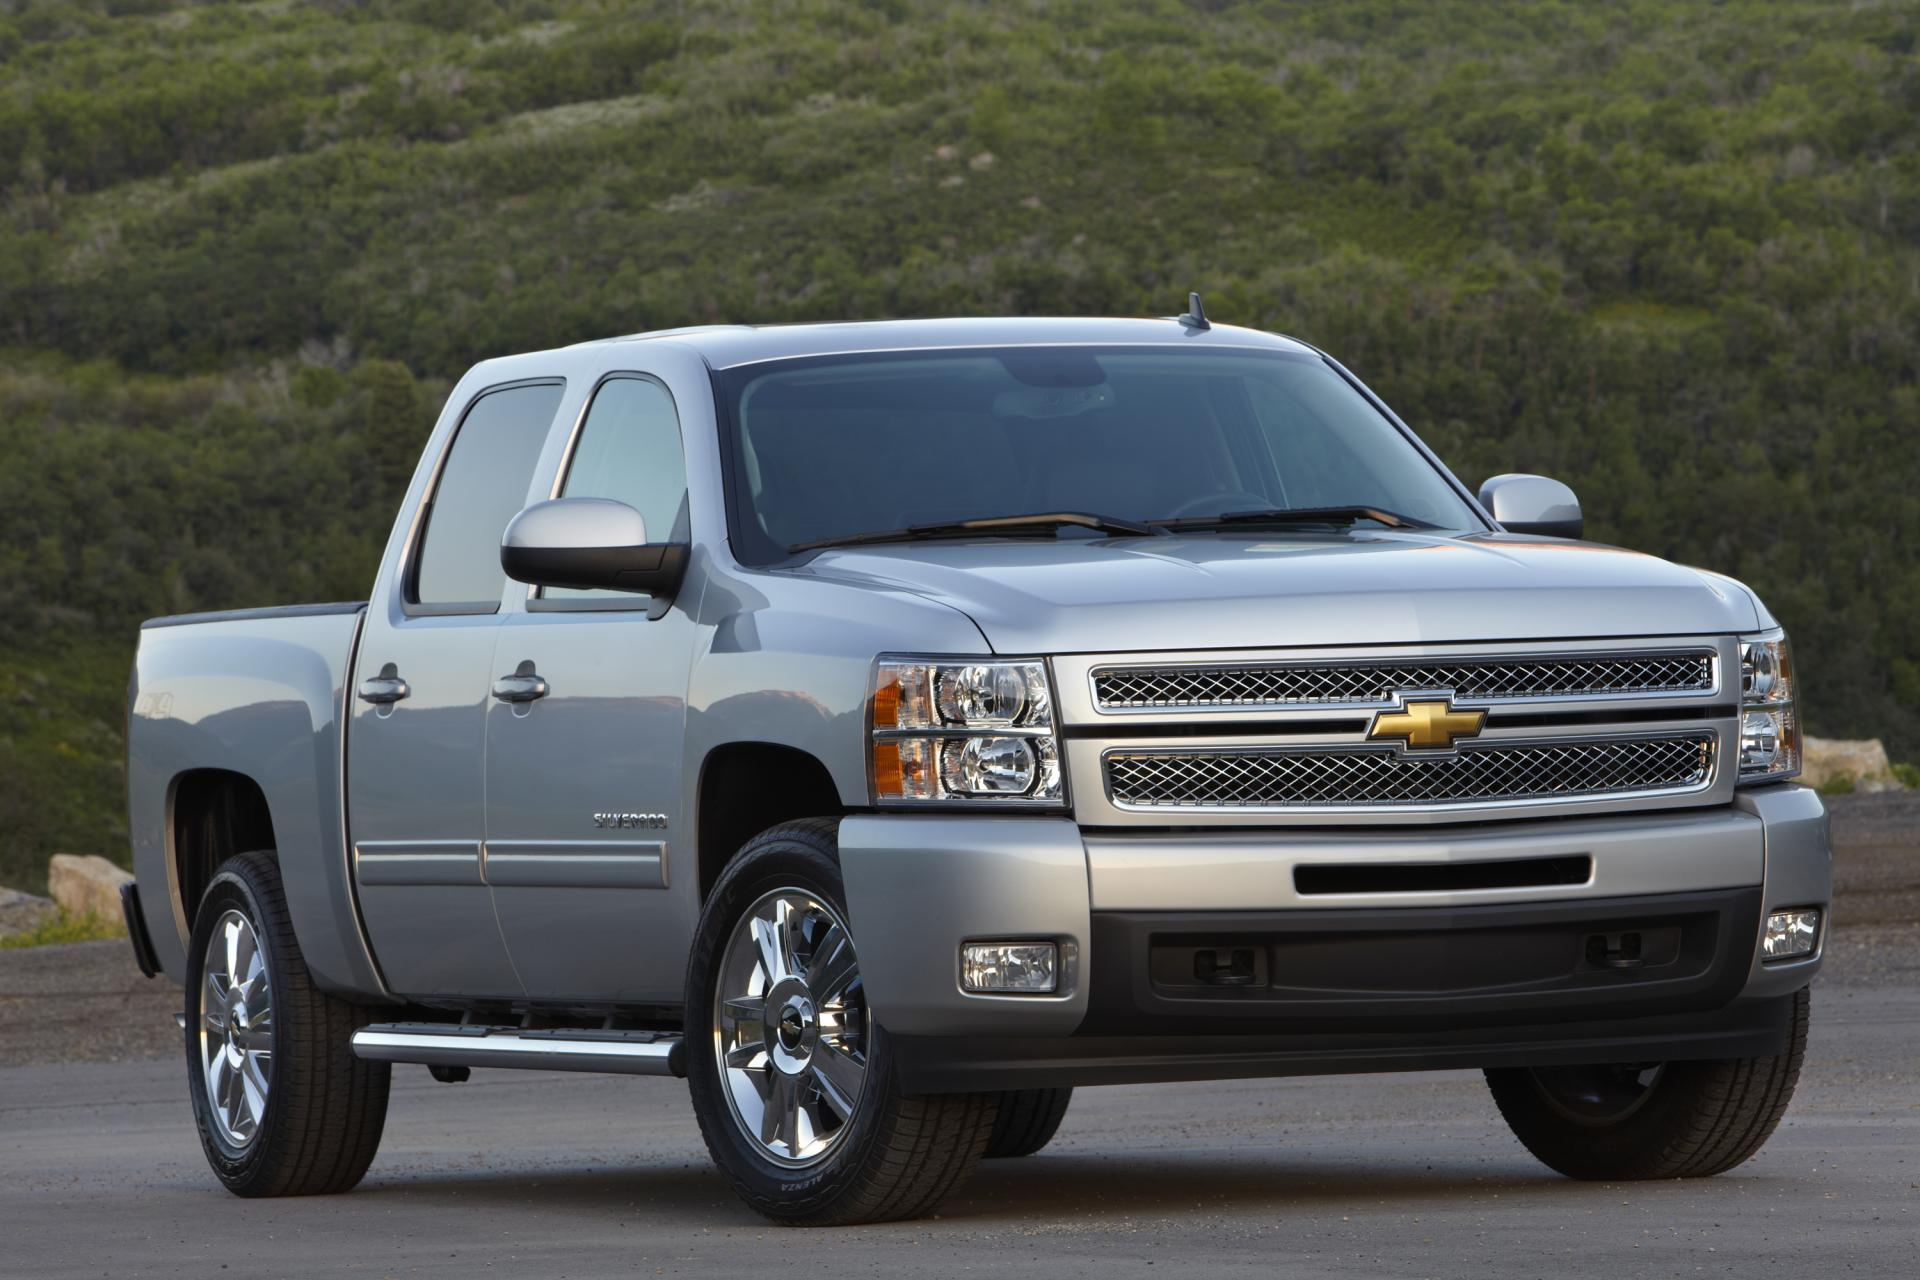 2012 Chevrolet Silverado News and Information